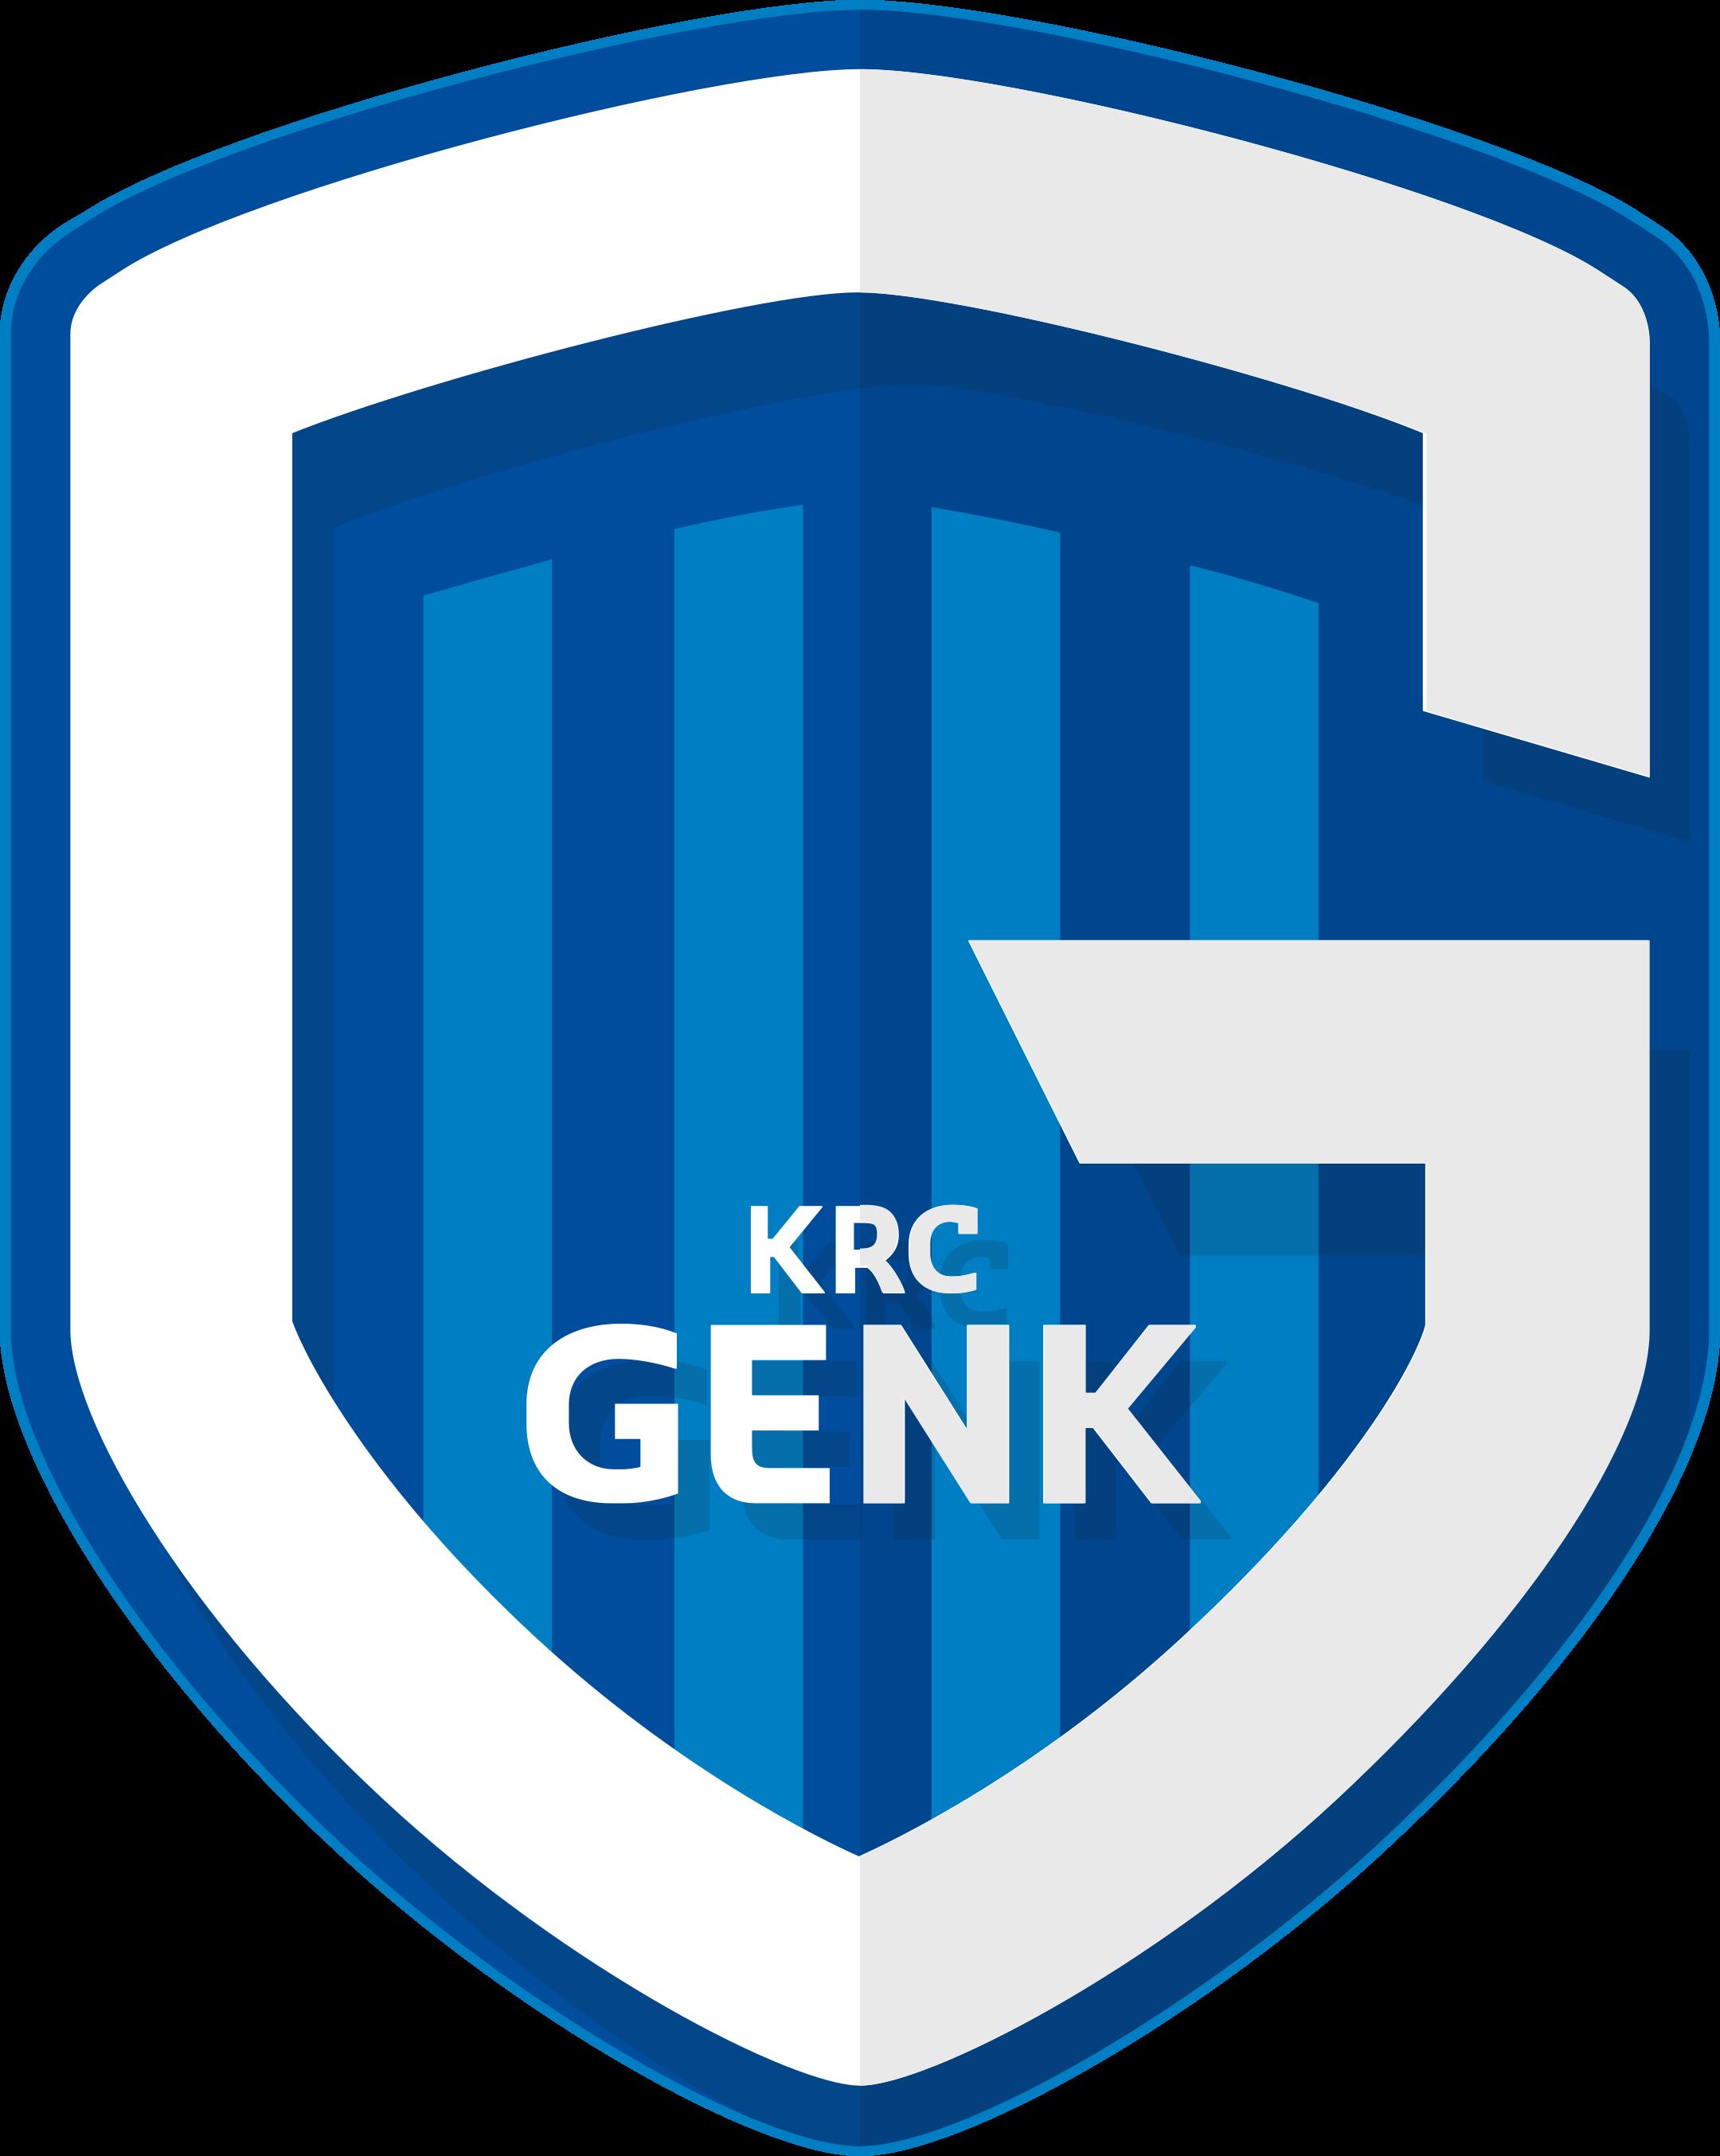 club genk logo 1 - K.R.C. Genk Logo